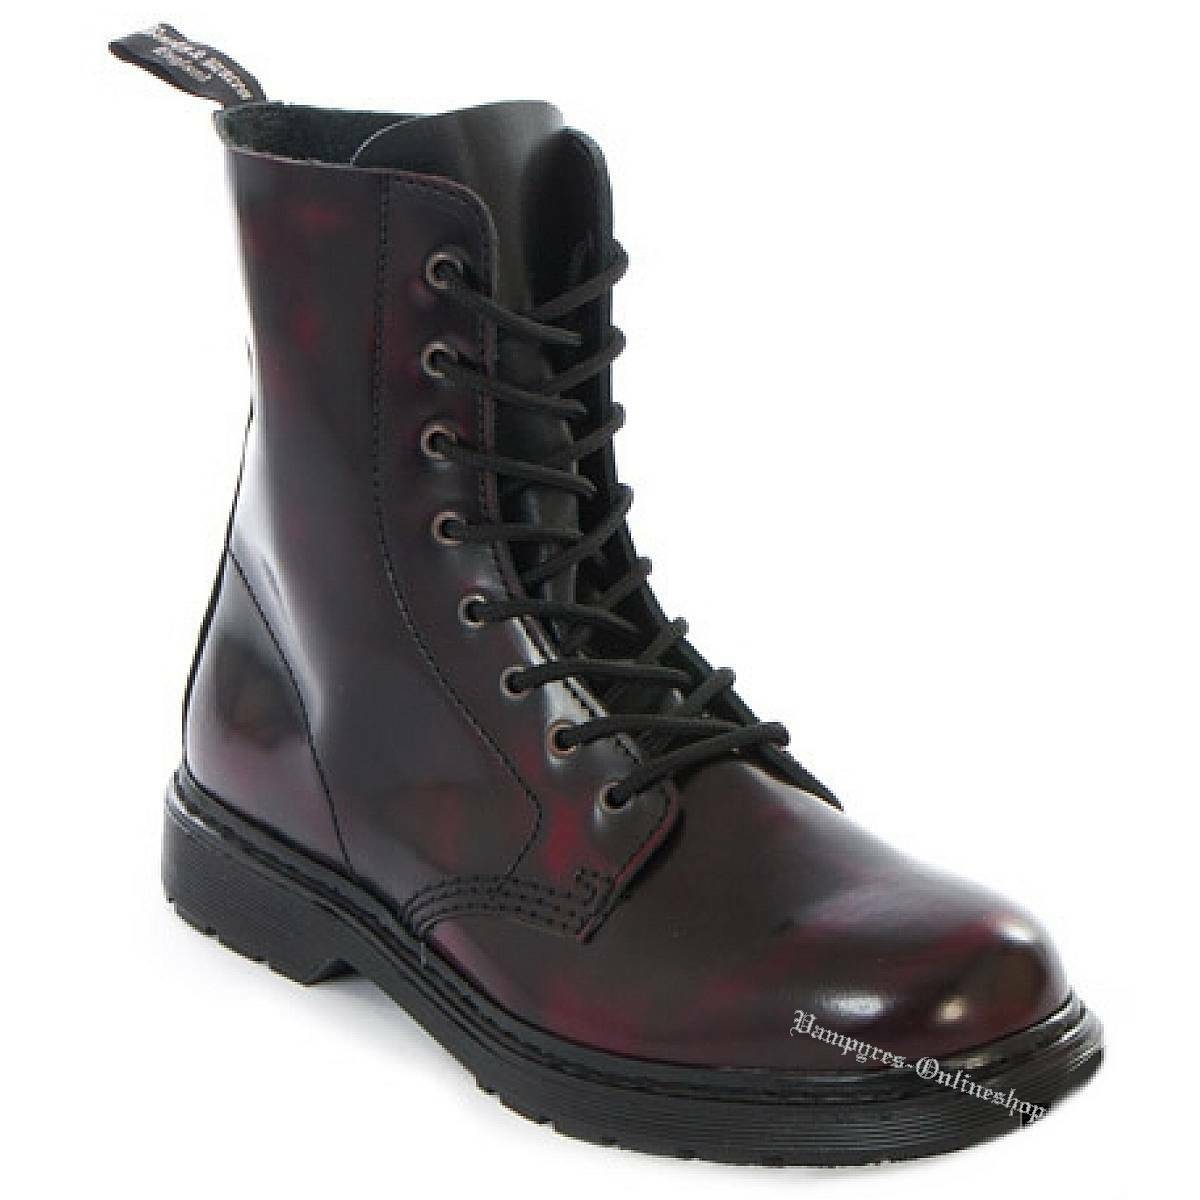 Stiefel And Braces Braces Braces Easy 8-Loch Burgundy Rub-Off Leder Schwarz Rot Stiefel Schuhe 36373d